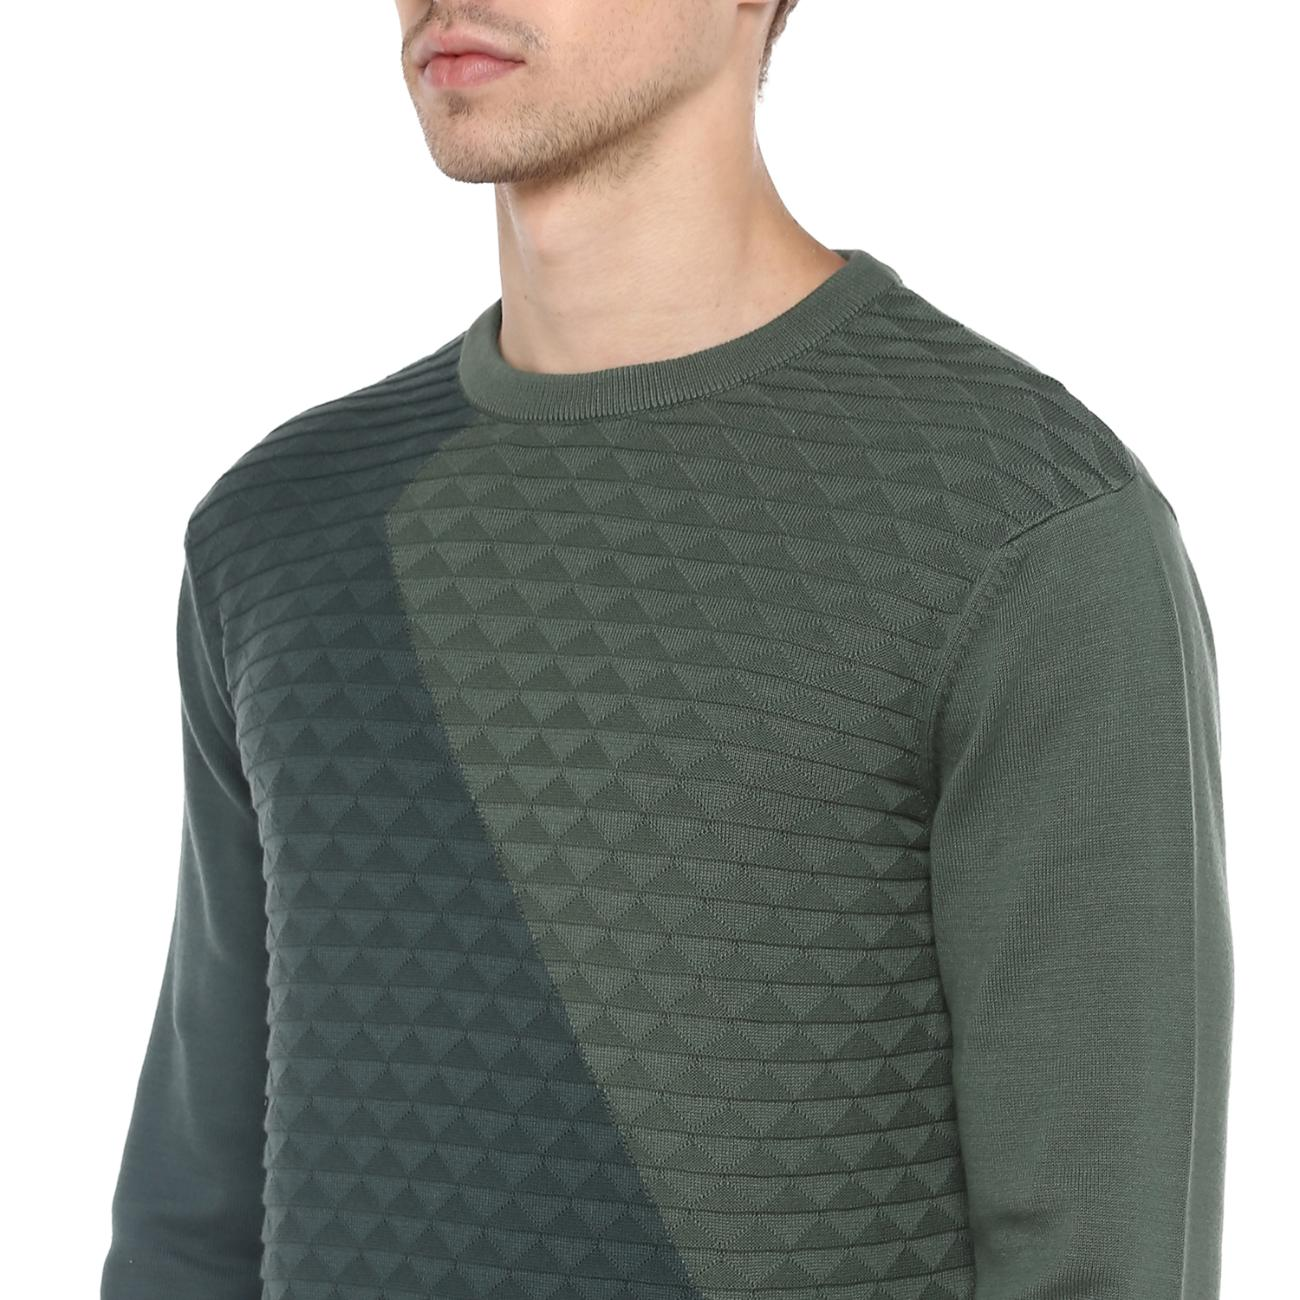 Buy Green Colourblocked Sweater Online